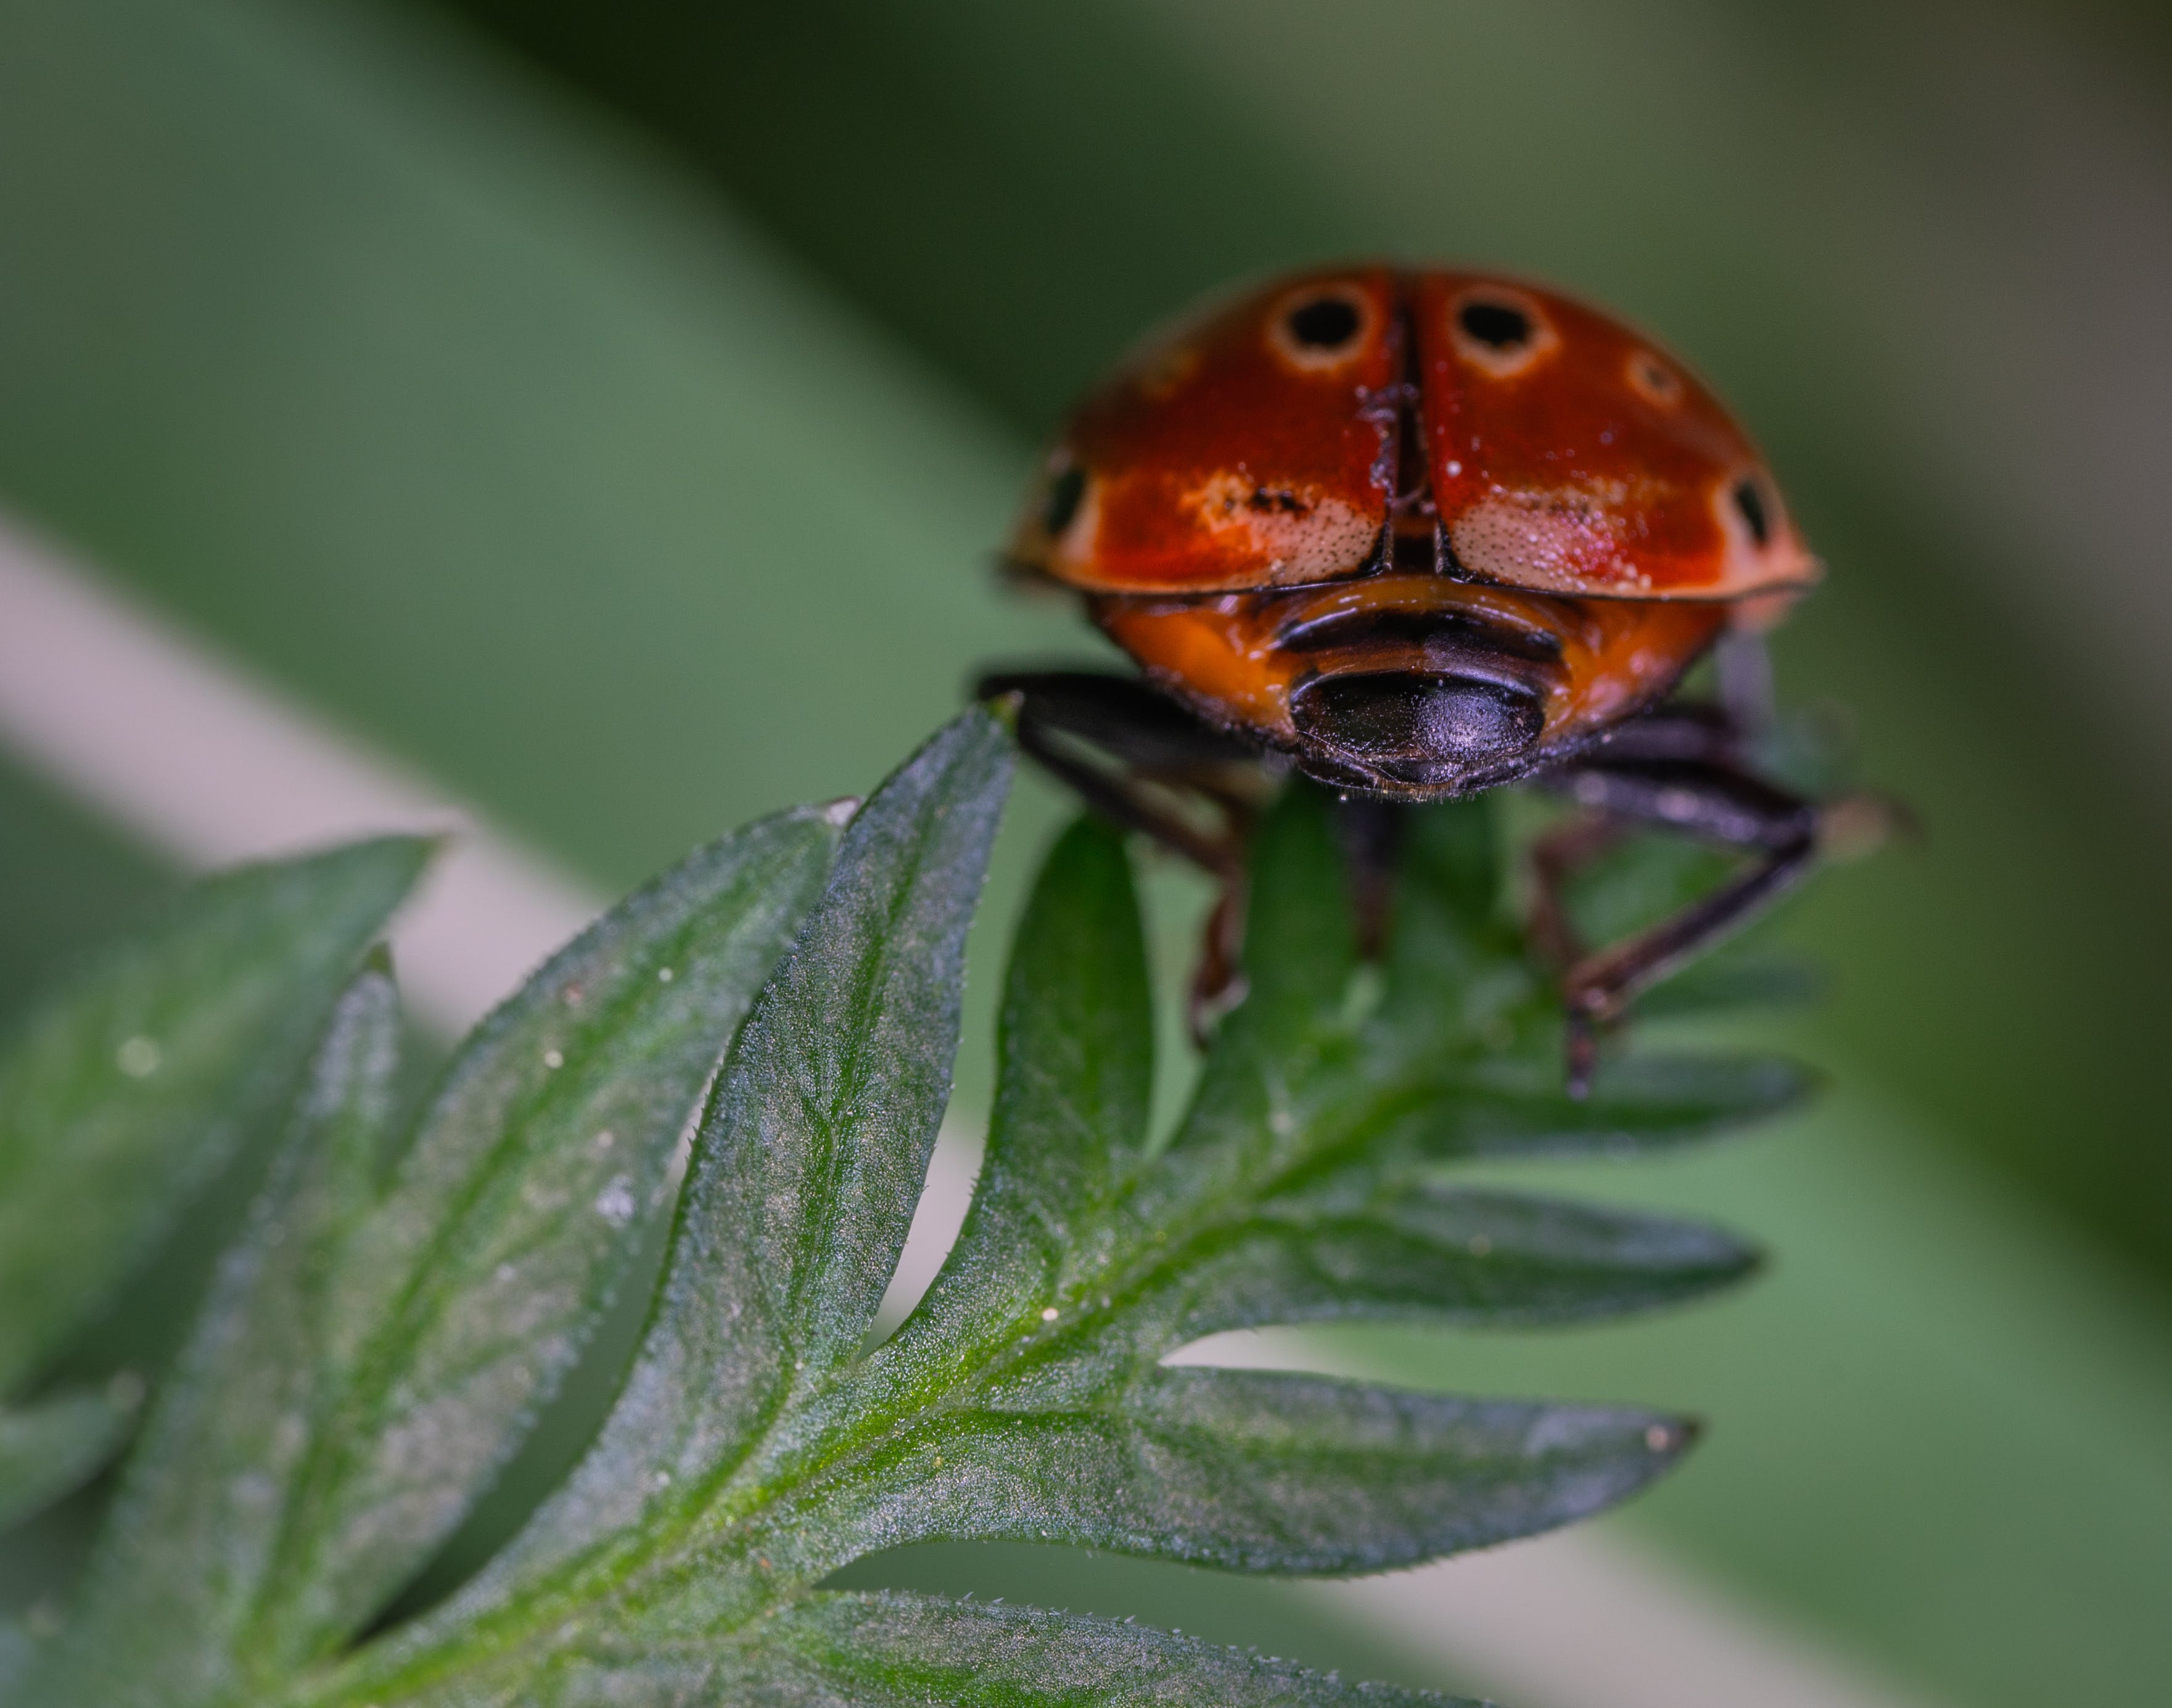 Gratis stockfoto met close-up, gras, insect, jong